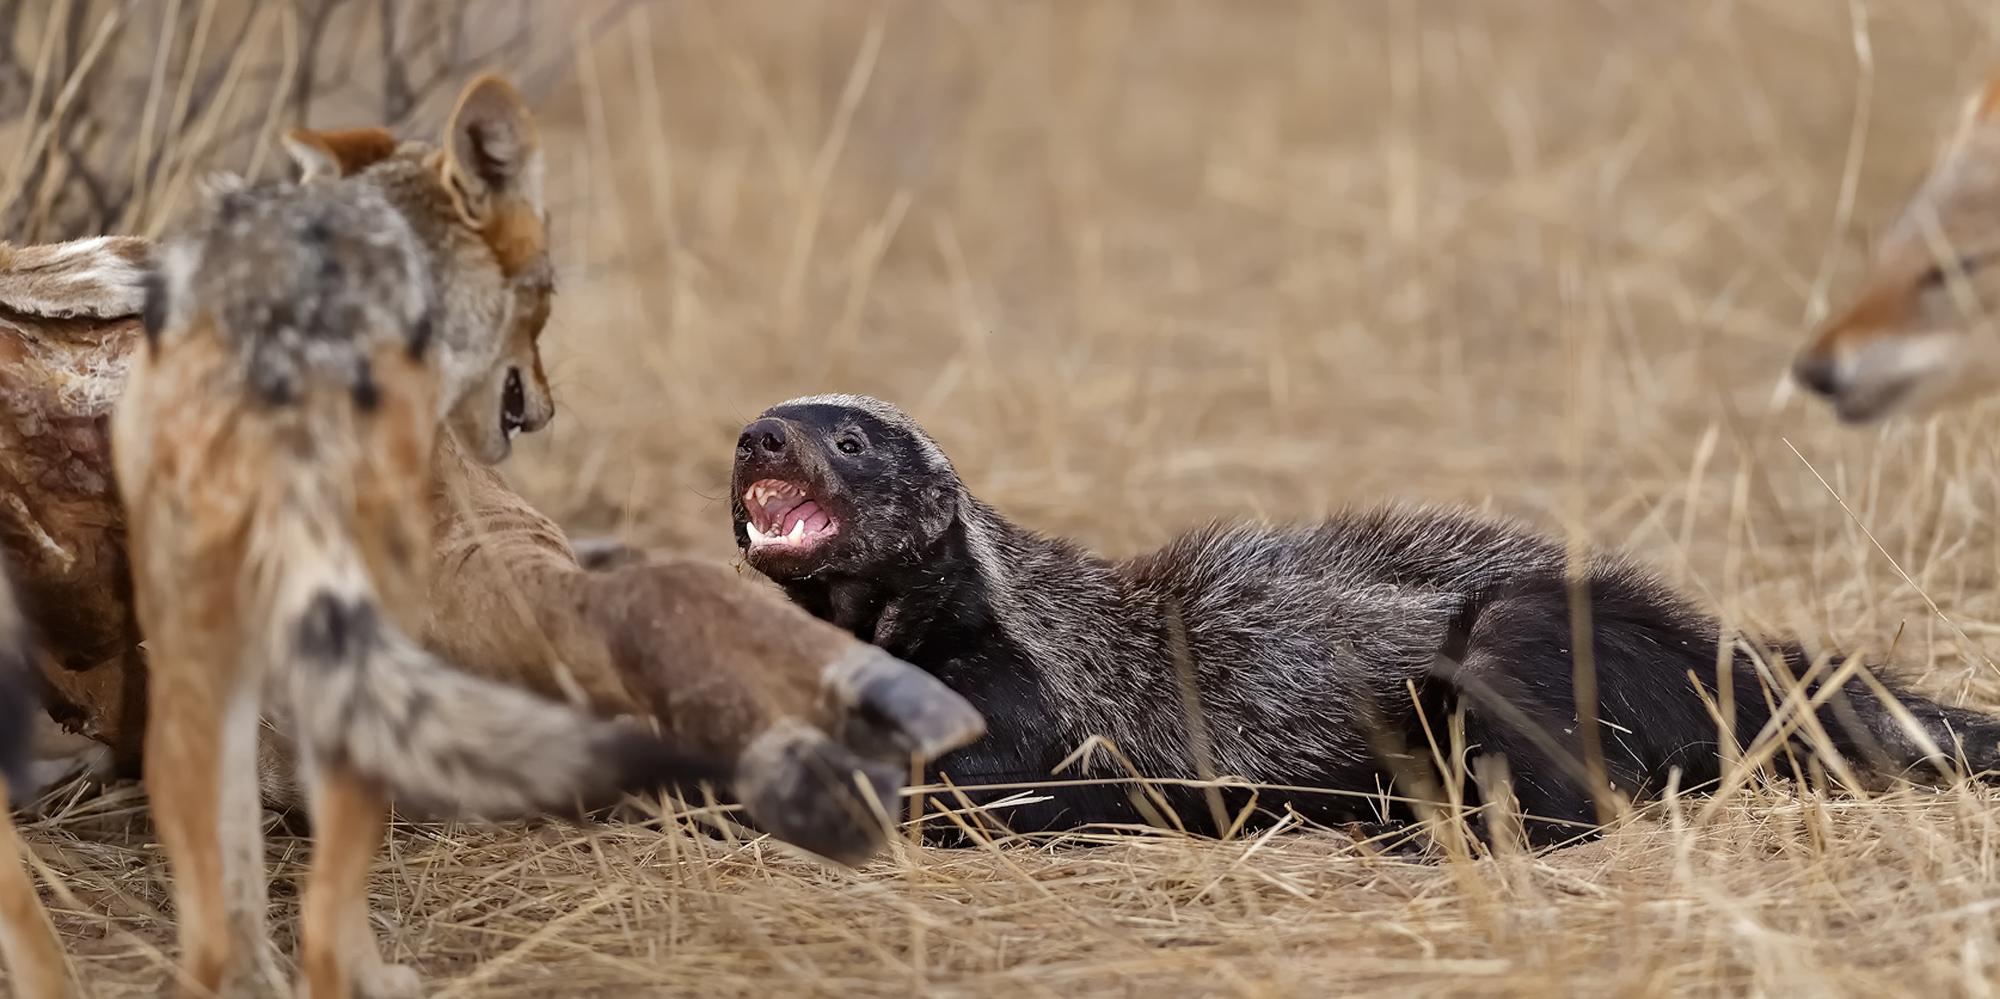 Black-backed jackals and honey badger at giraffe carcass